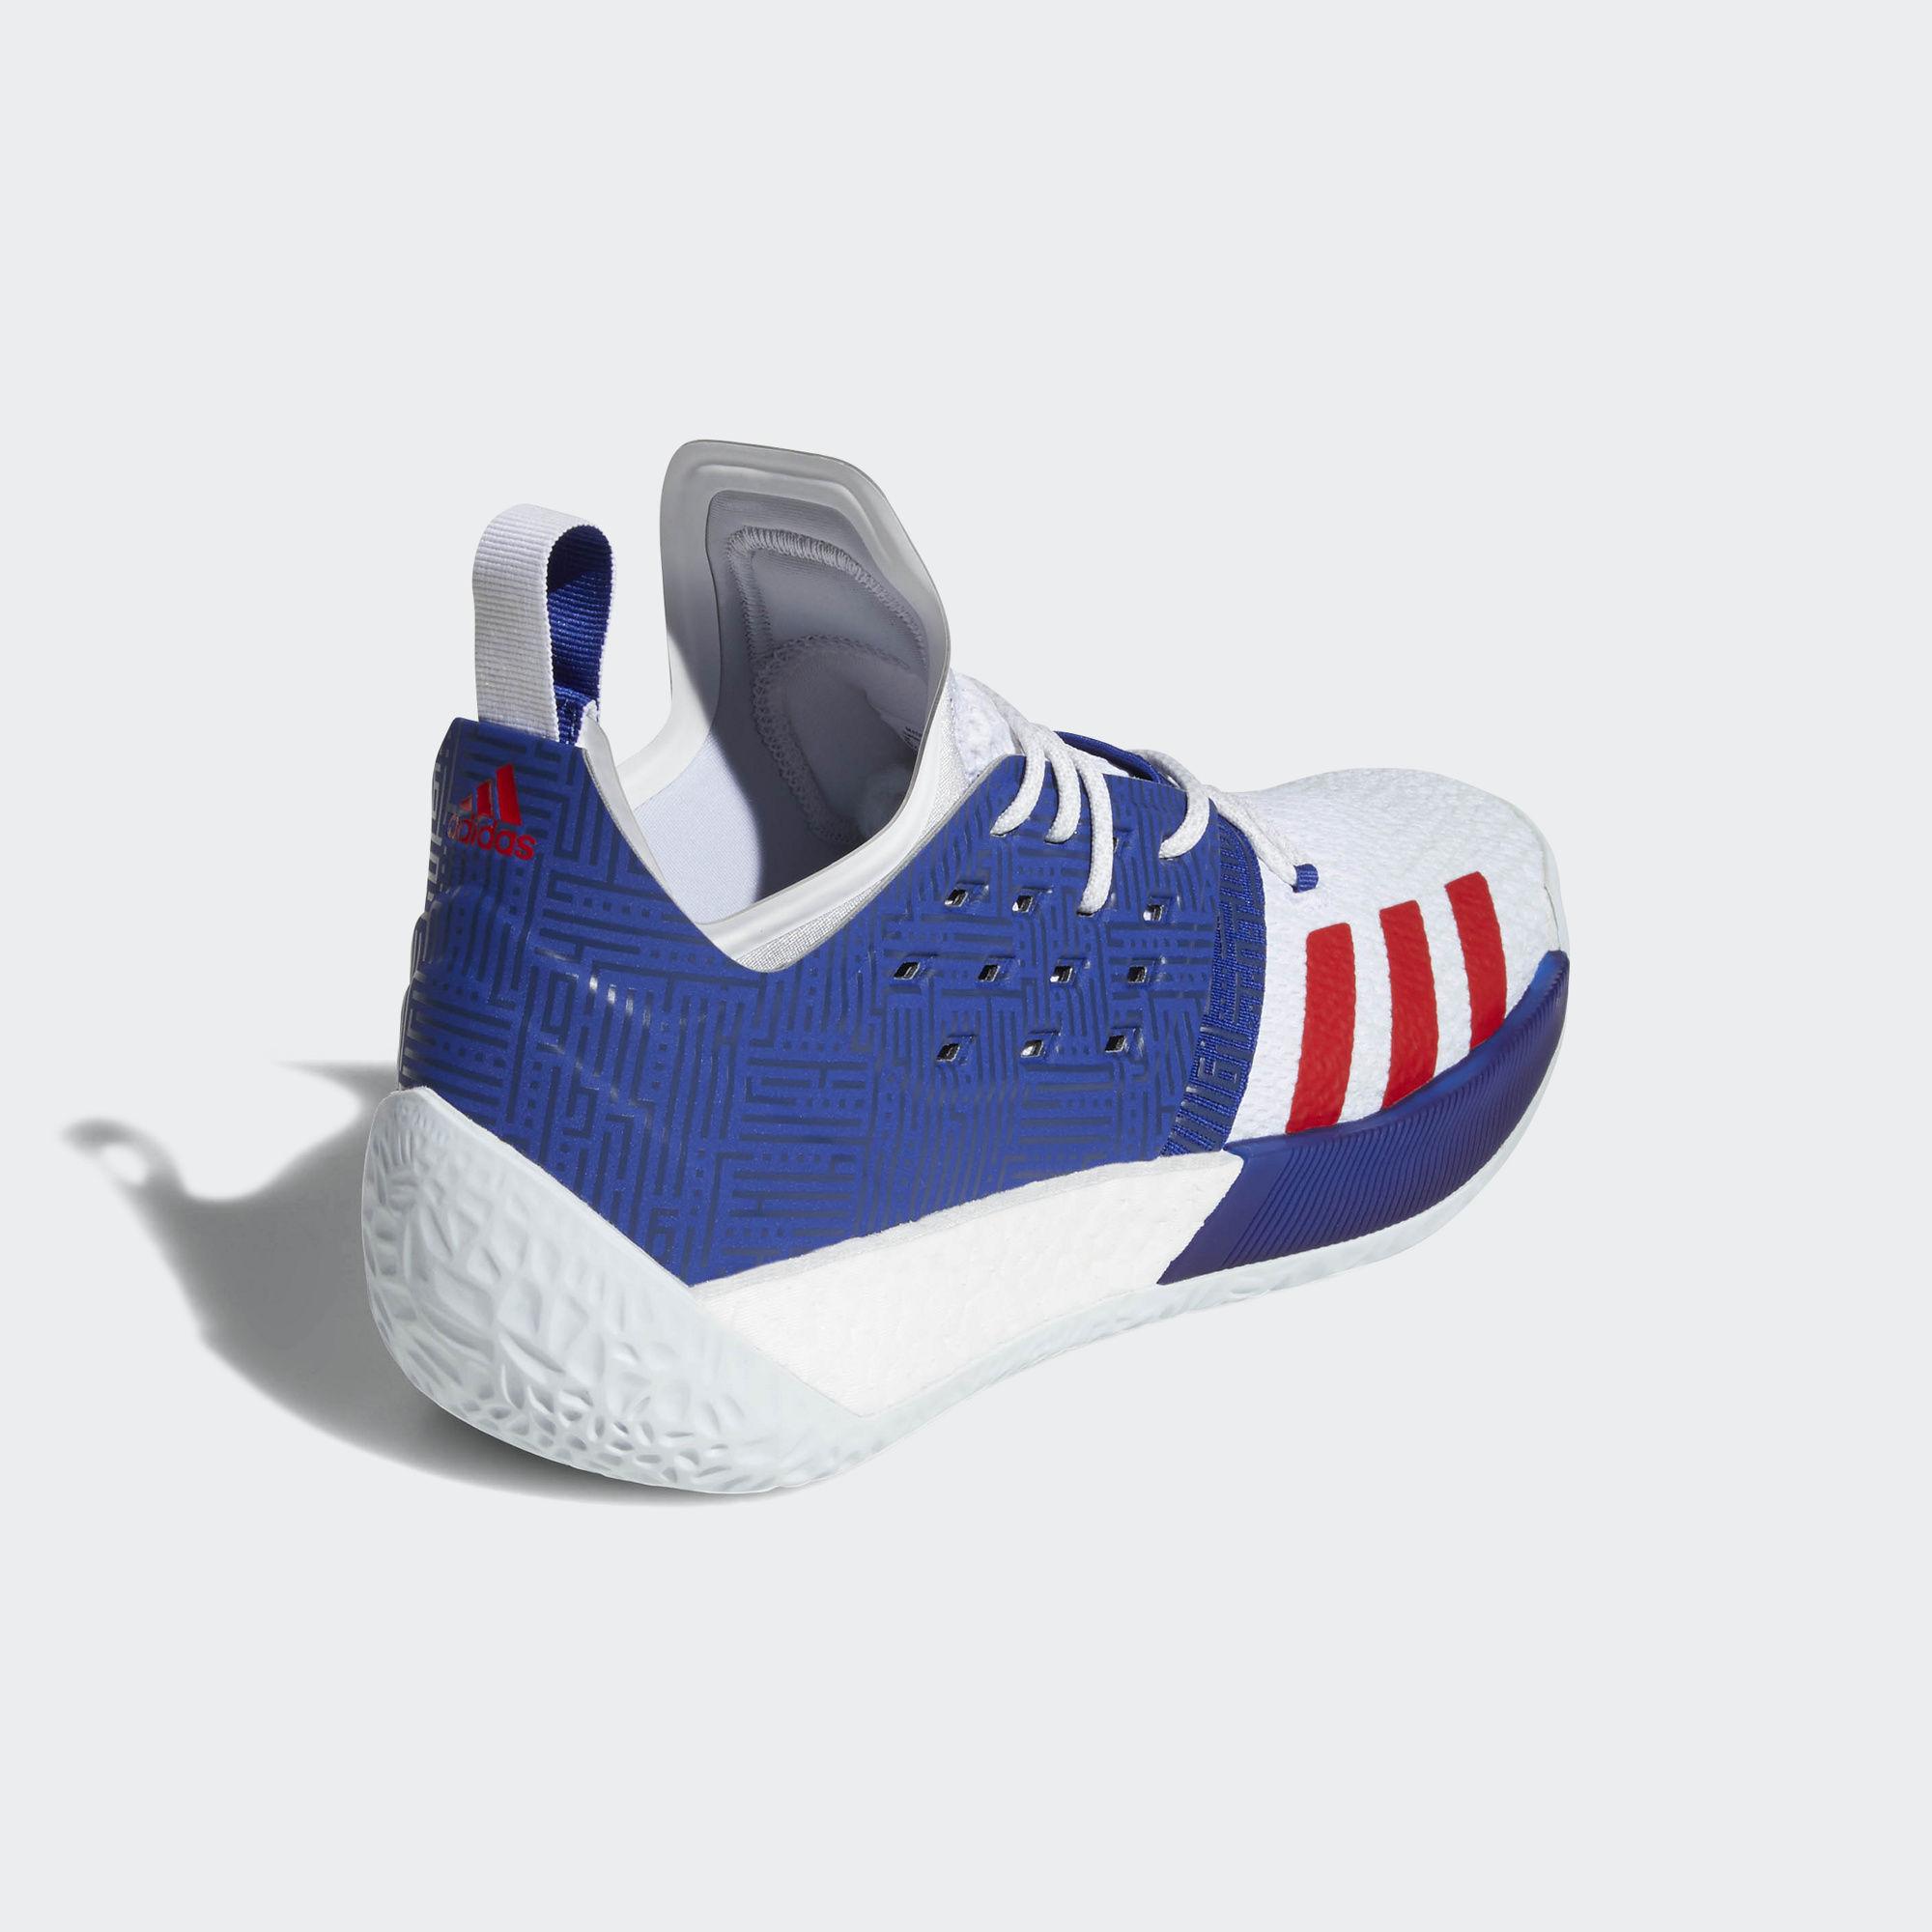 Adidas Harden Vol. 2 AQ0026